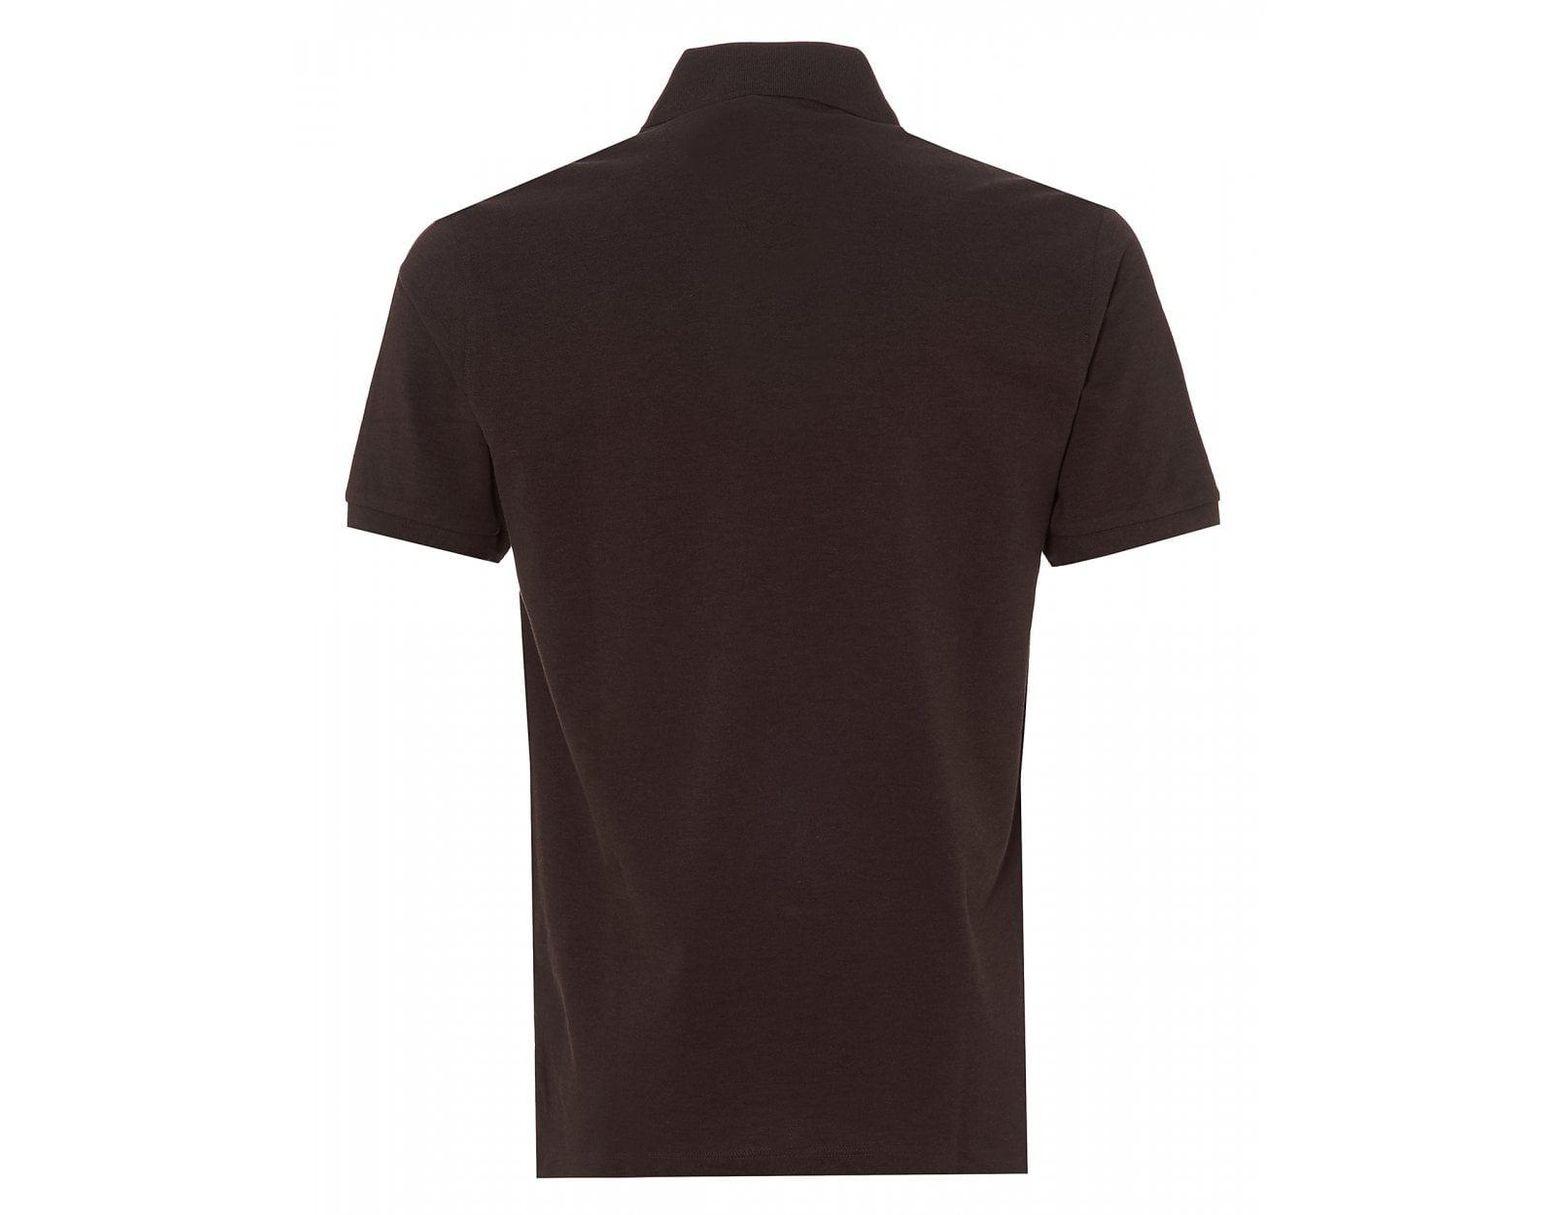 18d2a8c60 BOSS Pallas Pique Polo Shirt, Dark Brown Regular Fit Polo in Brown for Men  - Lyst